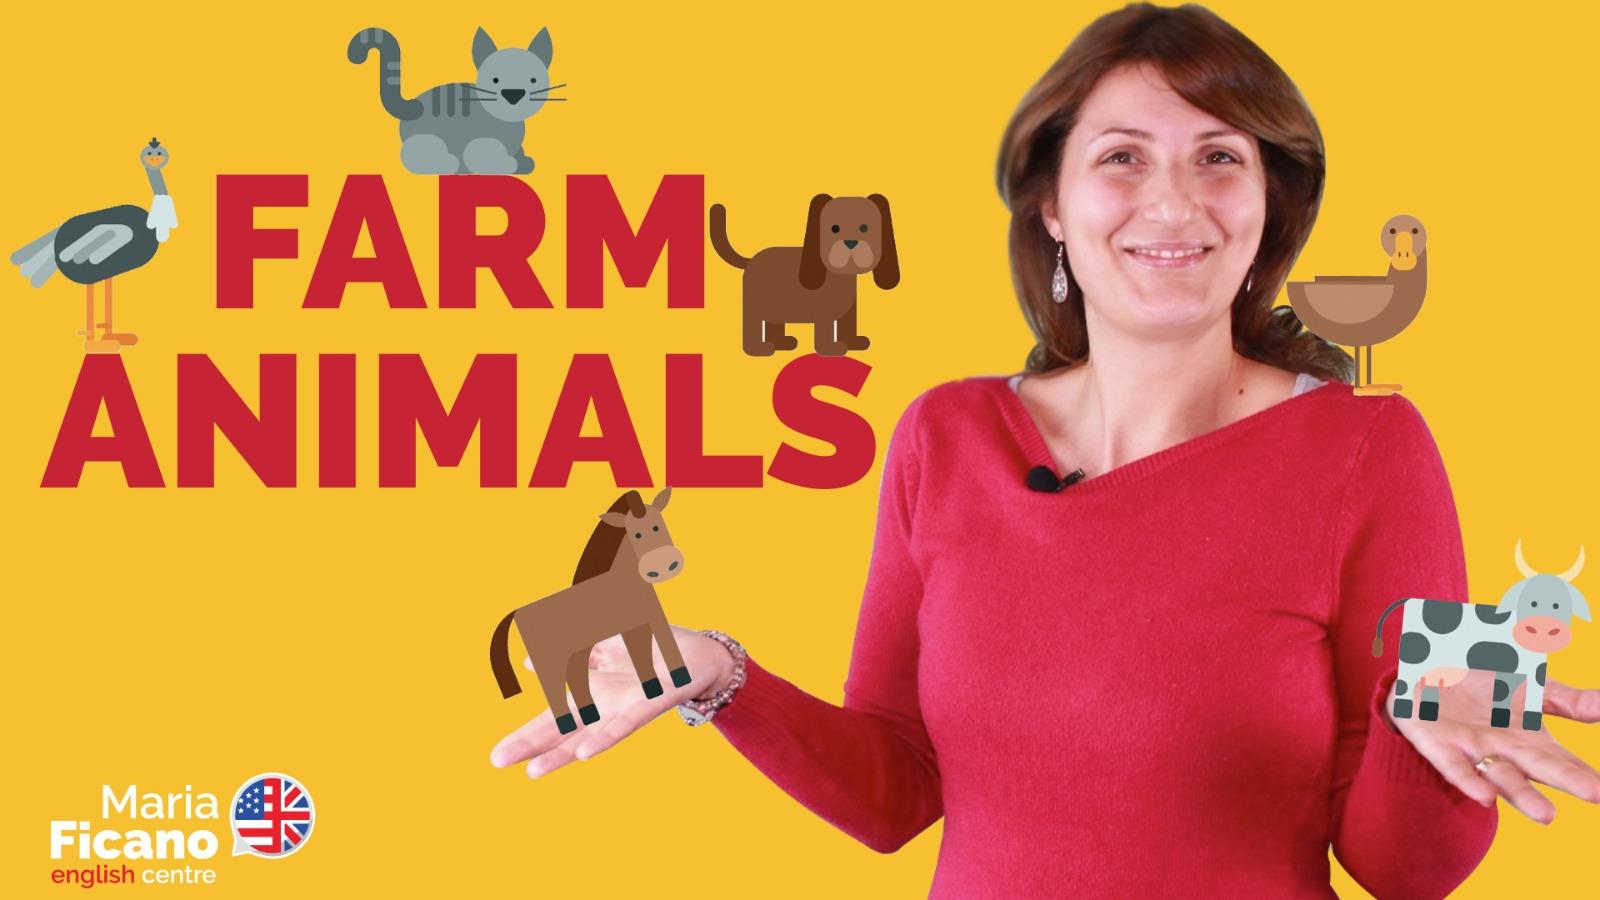 inglese animali fattoria